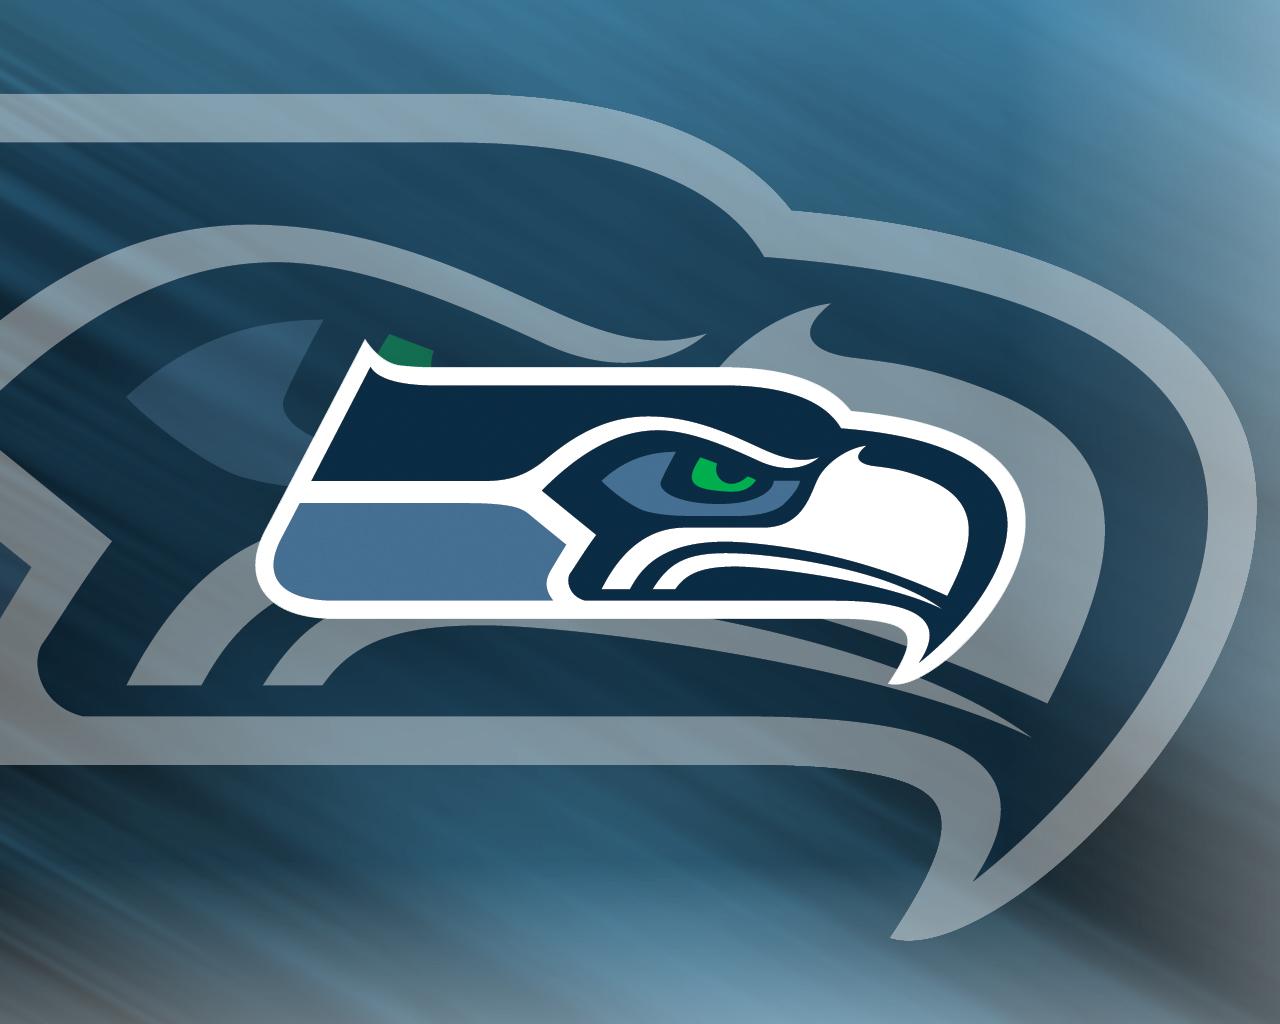 1280x1024 Nfl Seattle Seahawks 1 Photo